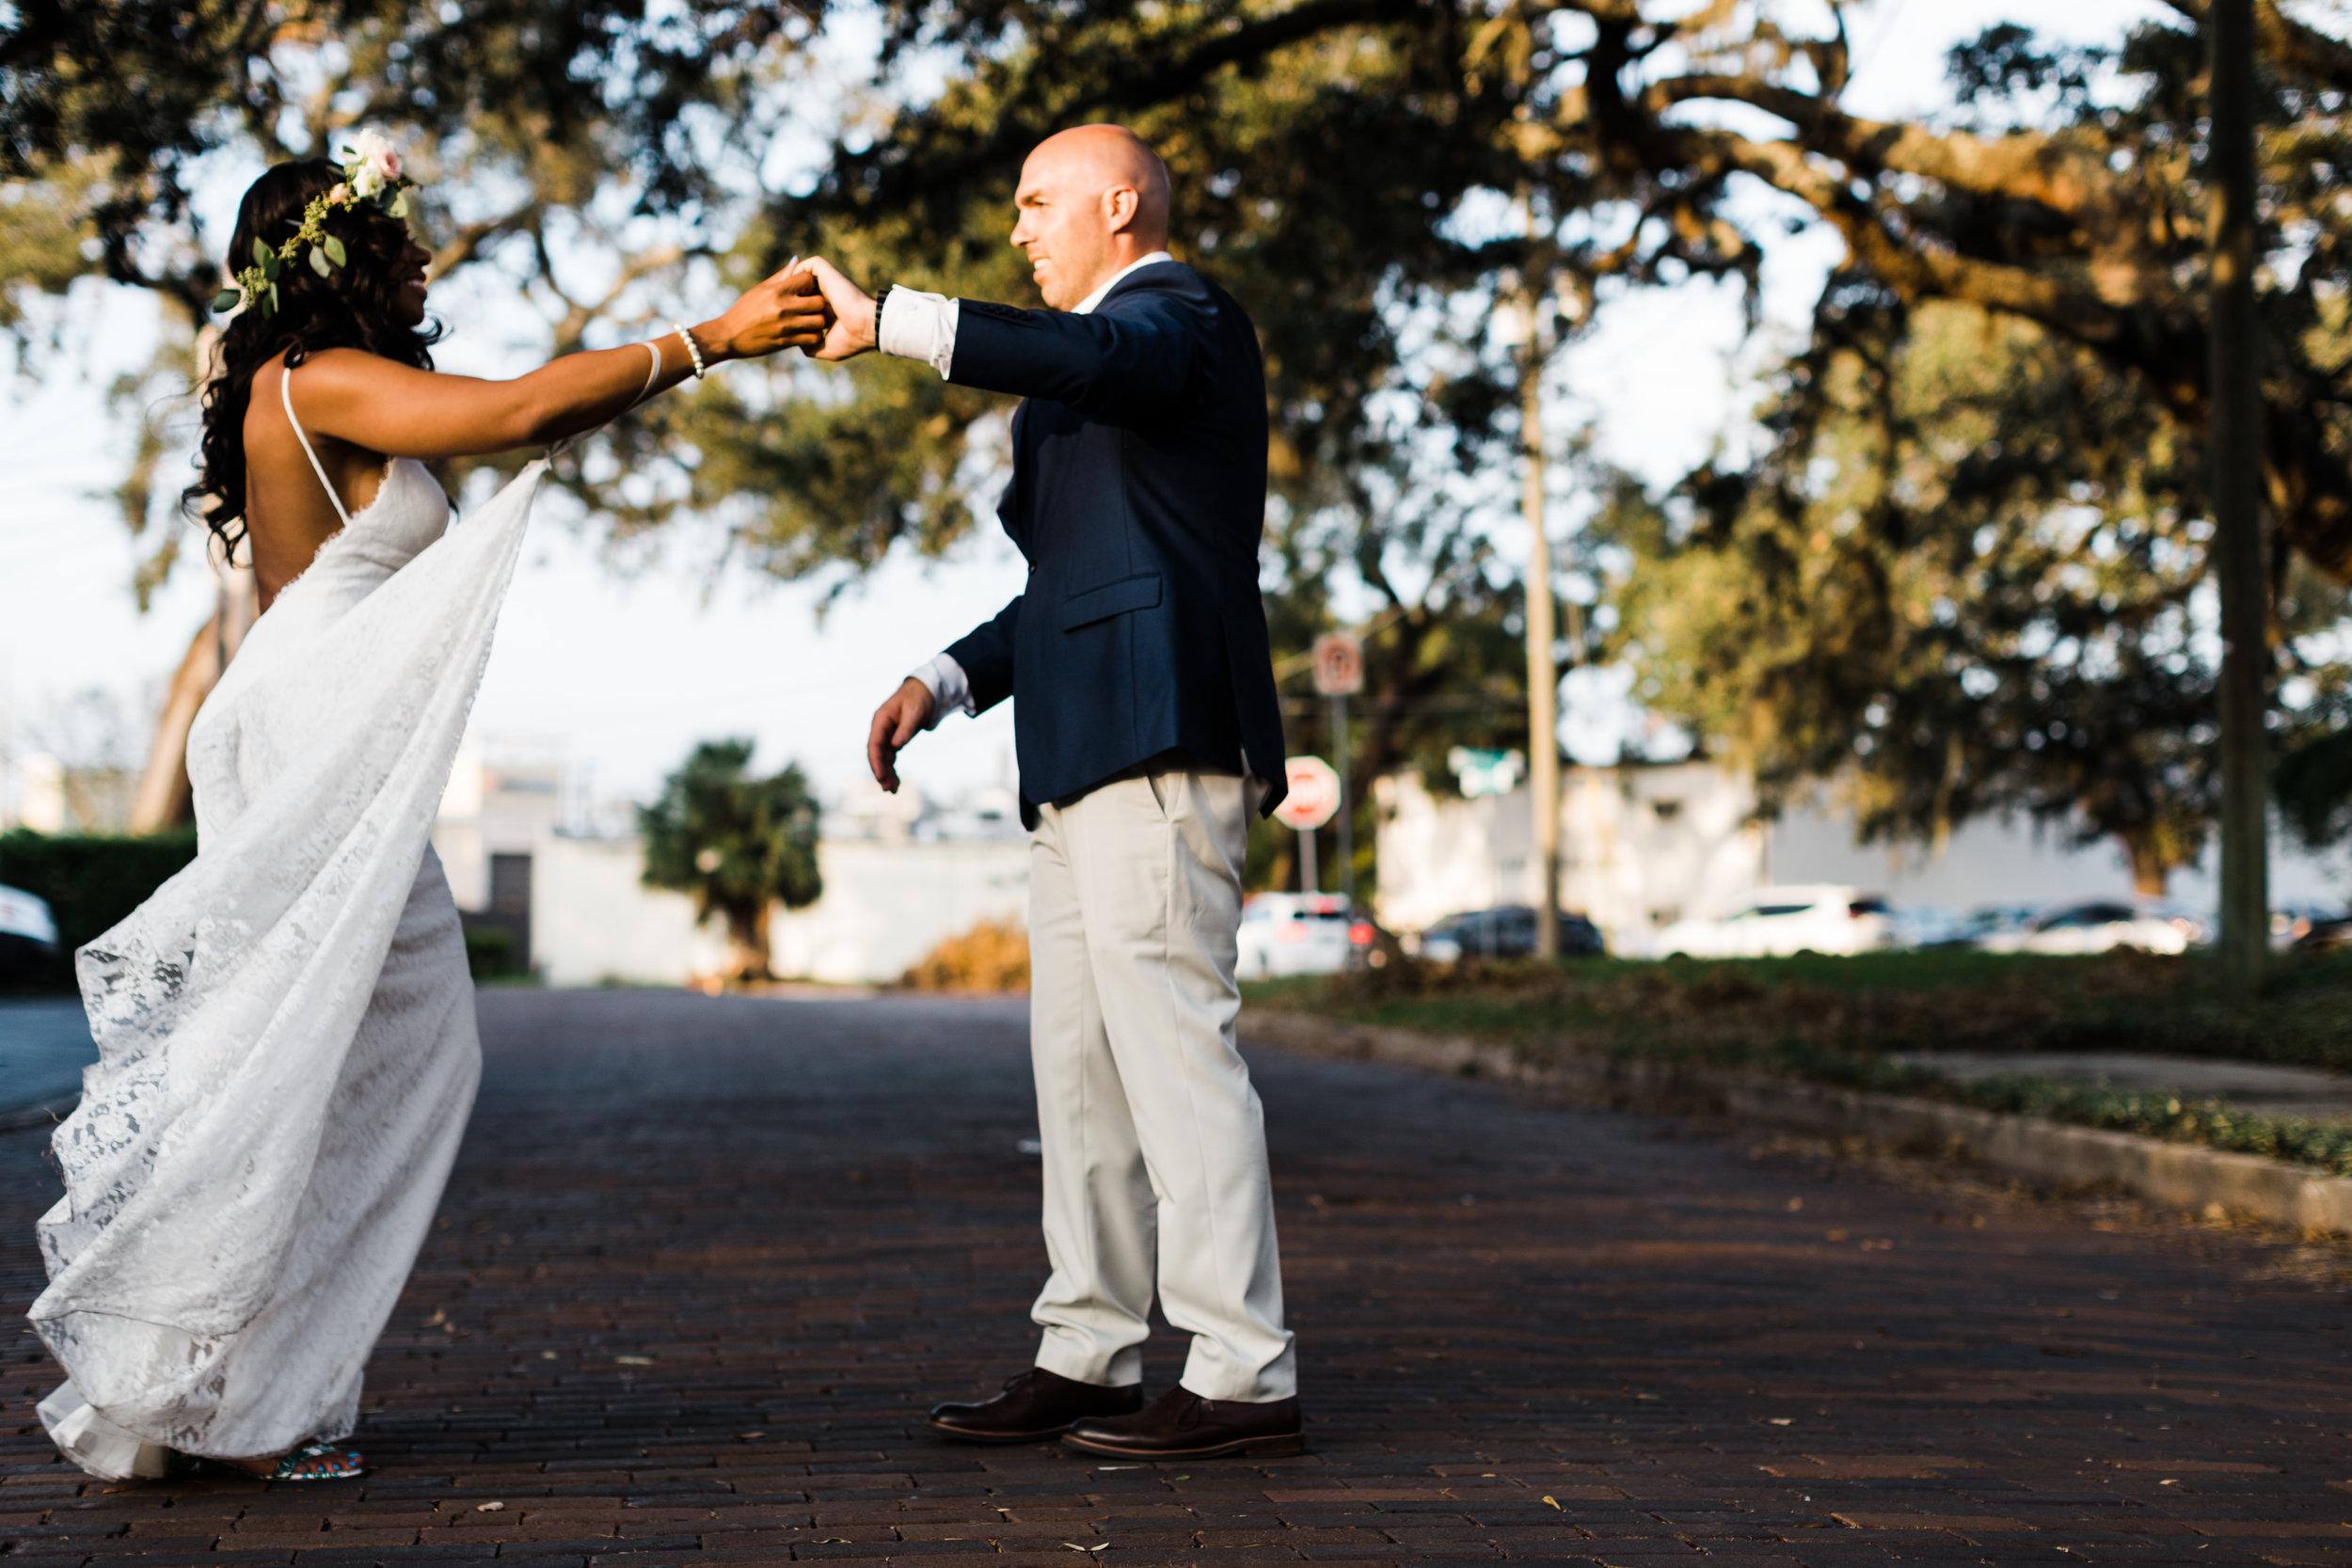 2017.09.16 Ashley and Chuck O'Day Quantam Leap Winery Wedding (419 of 462).jpg